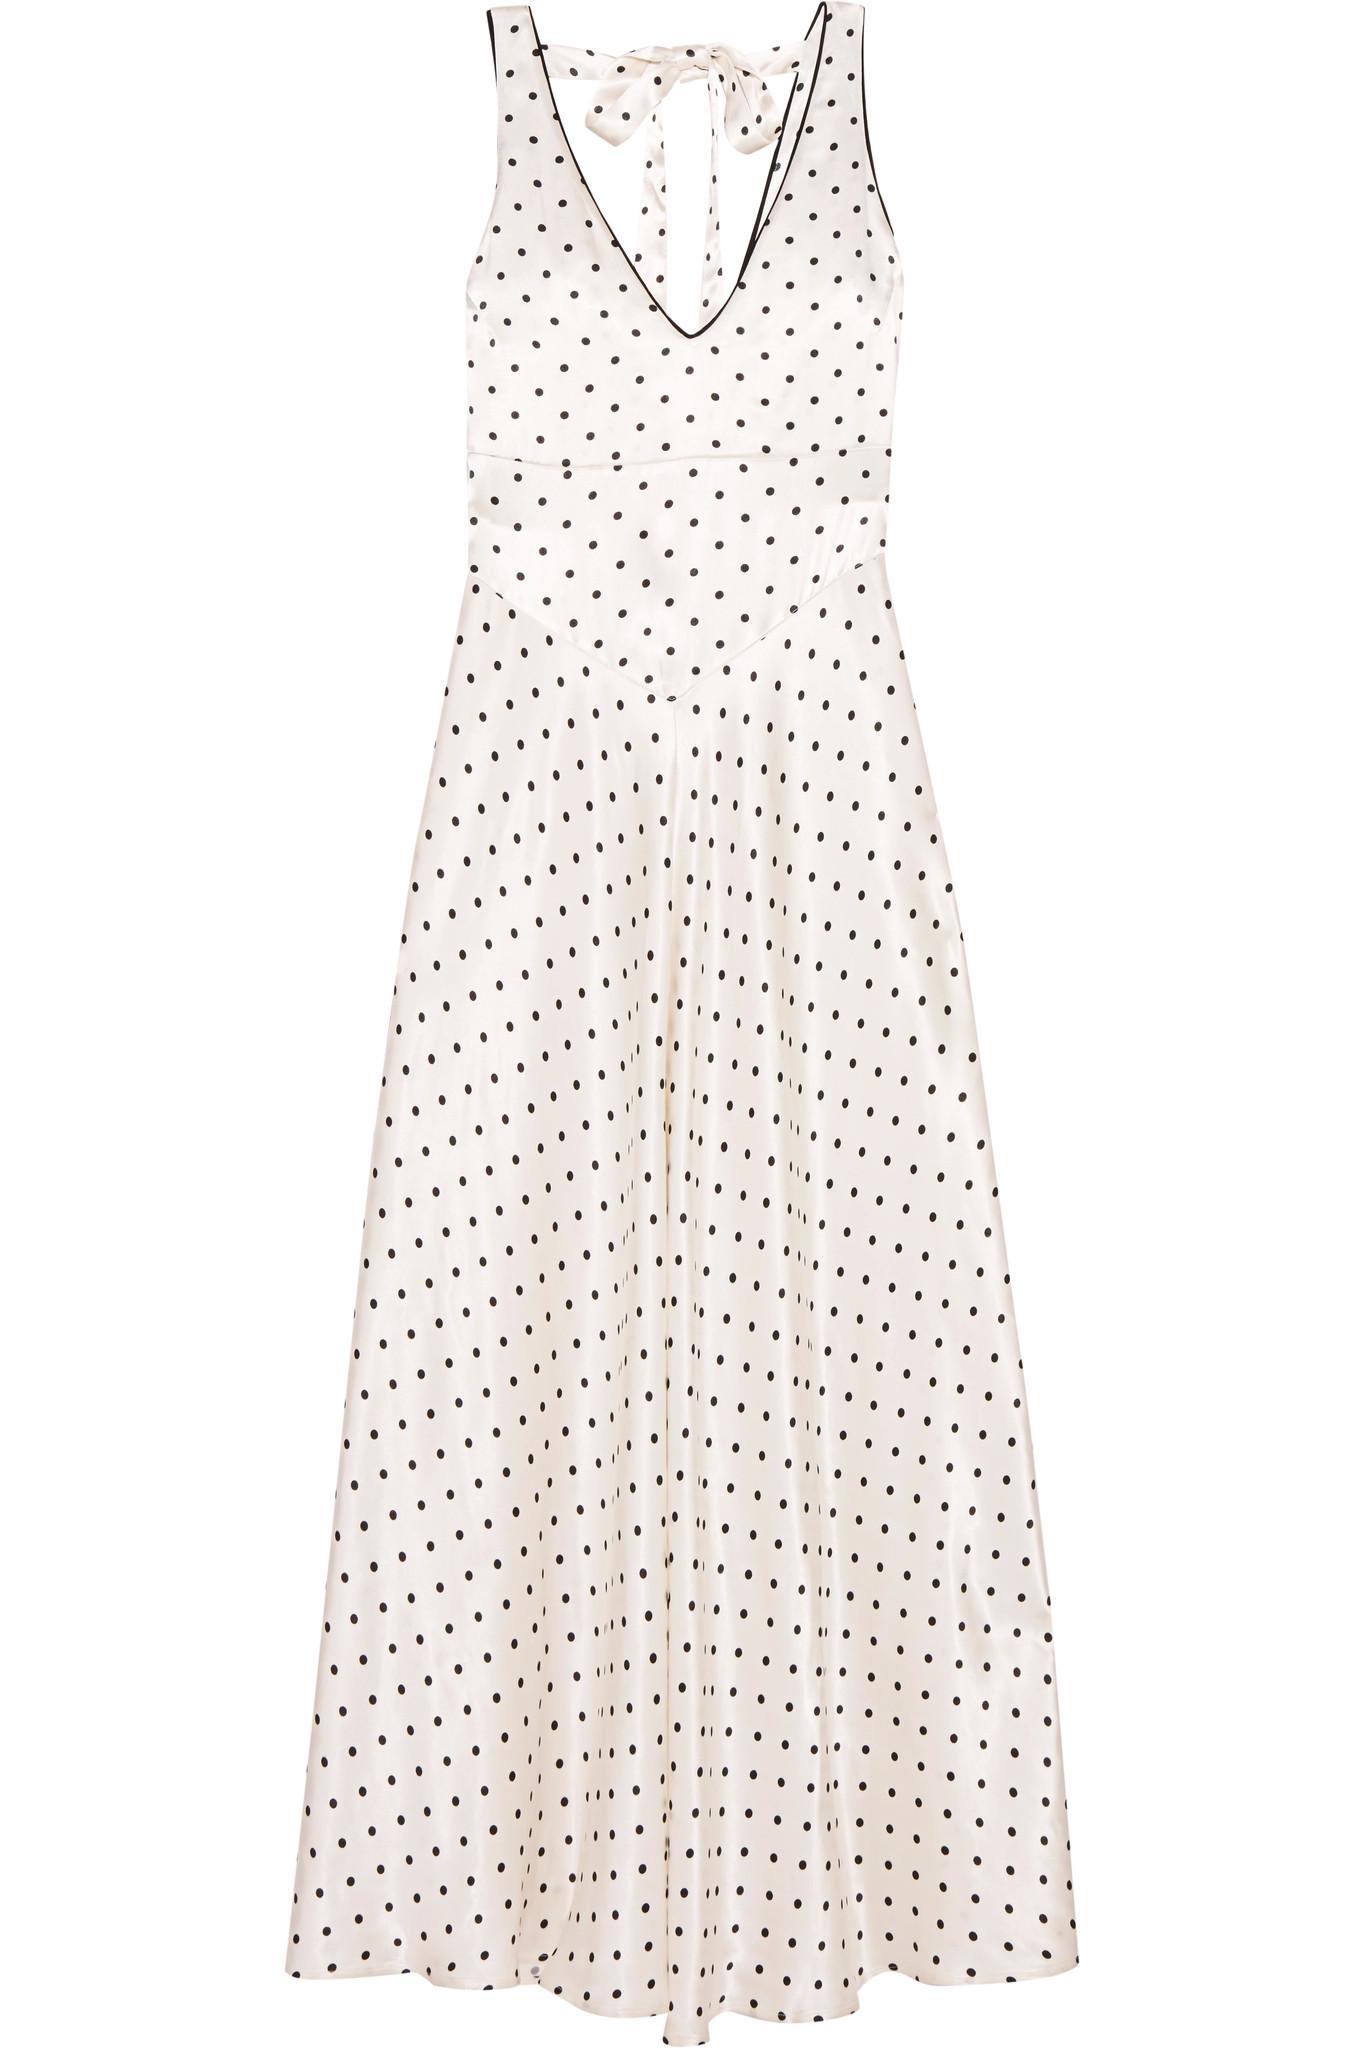 6abaa876b2 Ganni Leclair Open-back Polka-dot Satin Maxi Dress in White - Lyst